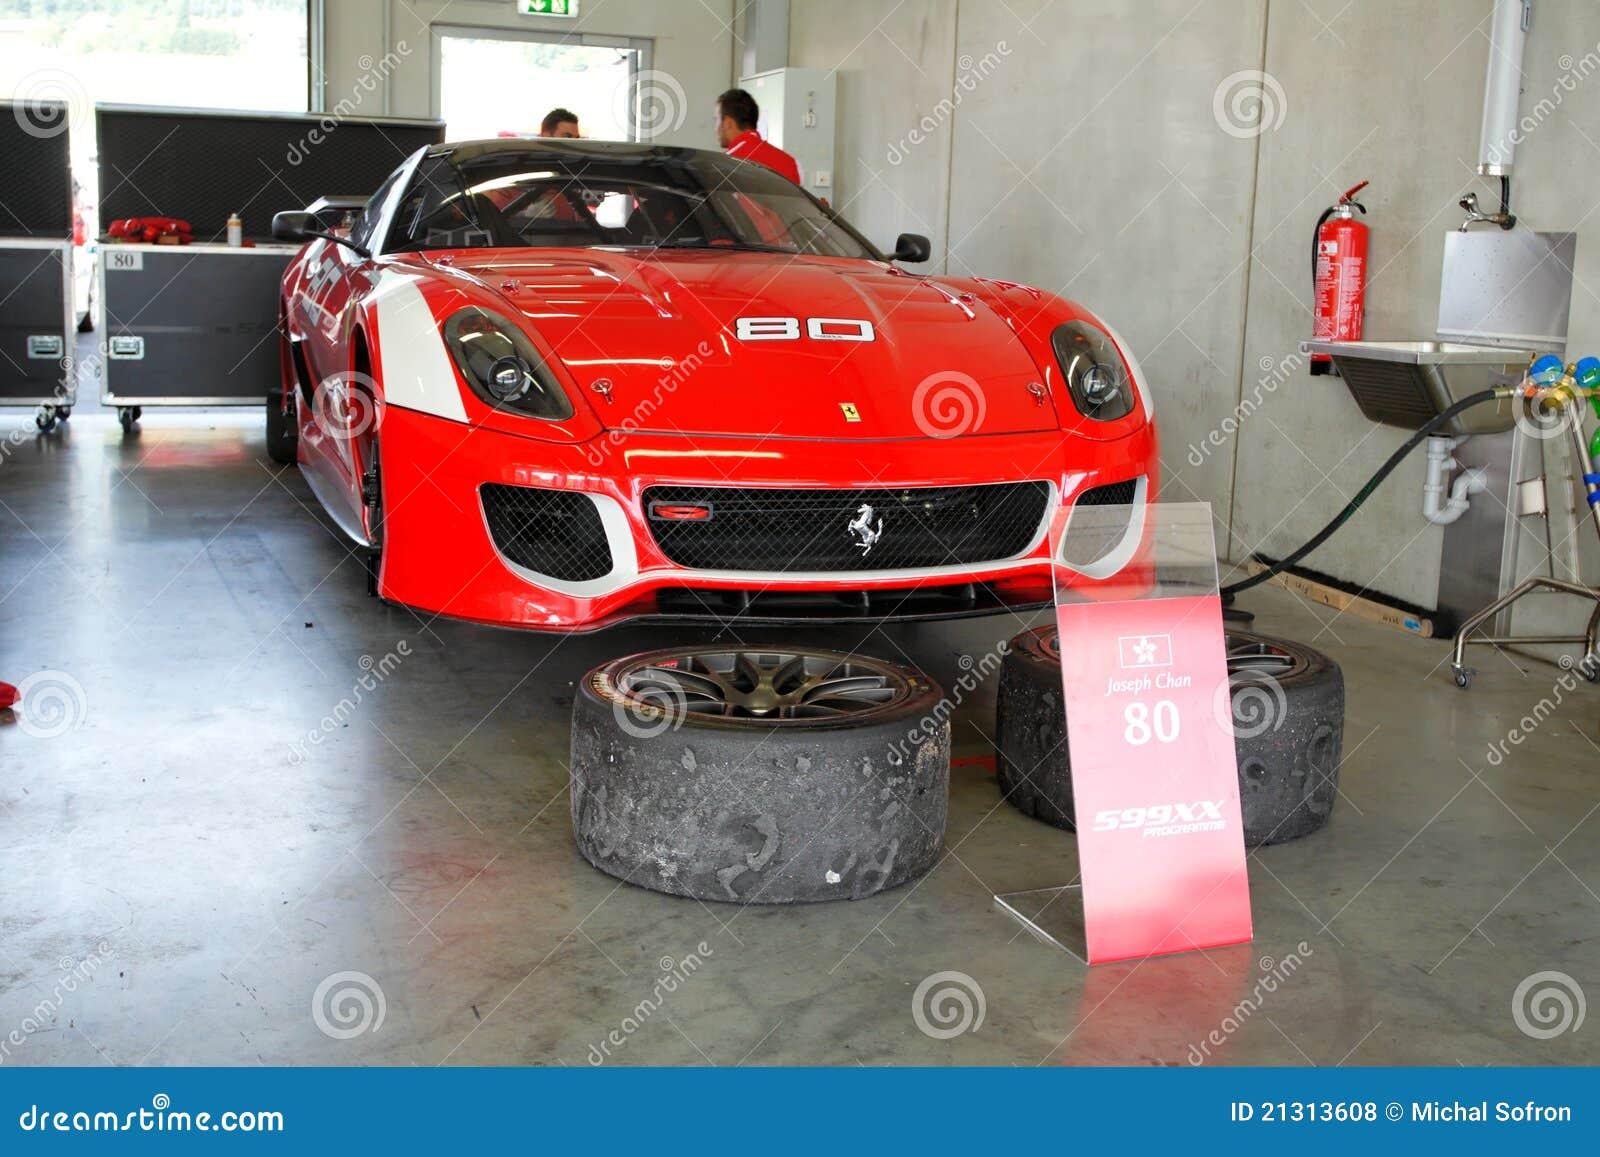 Ferrari 599xx in garage redactionele stock foto for Garage formule m